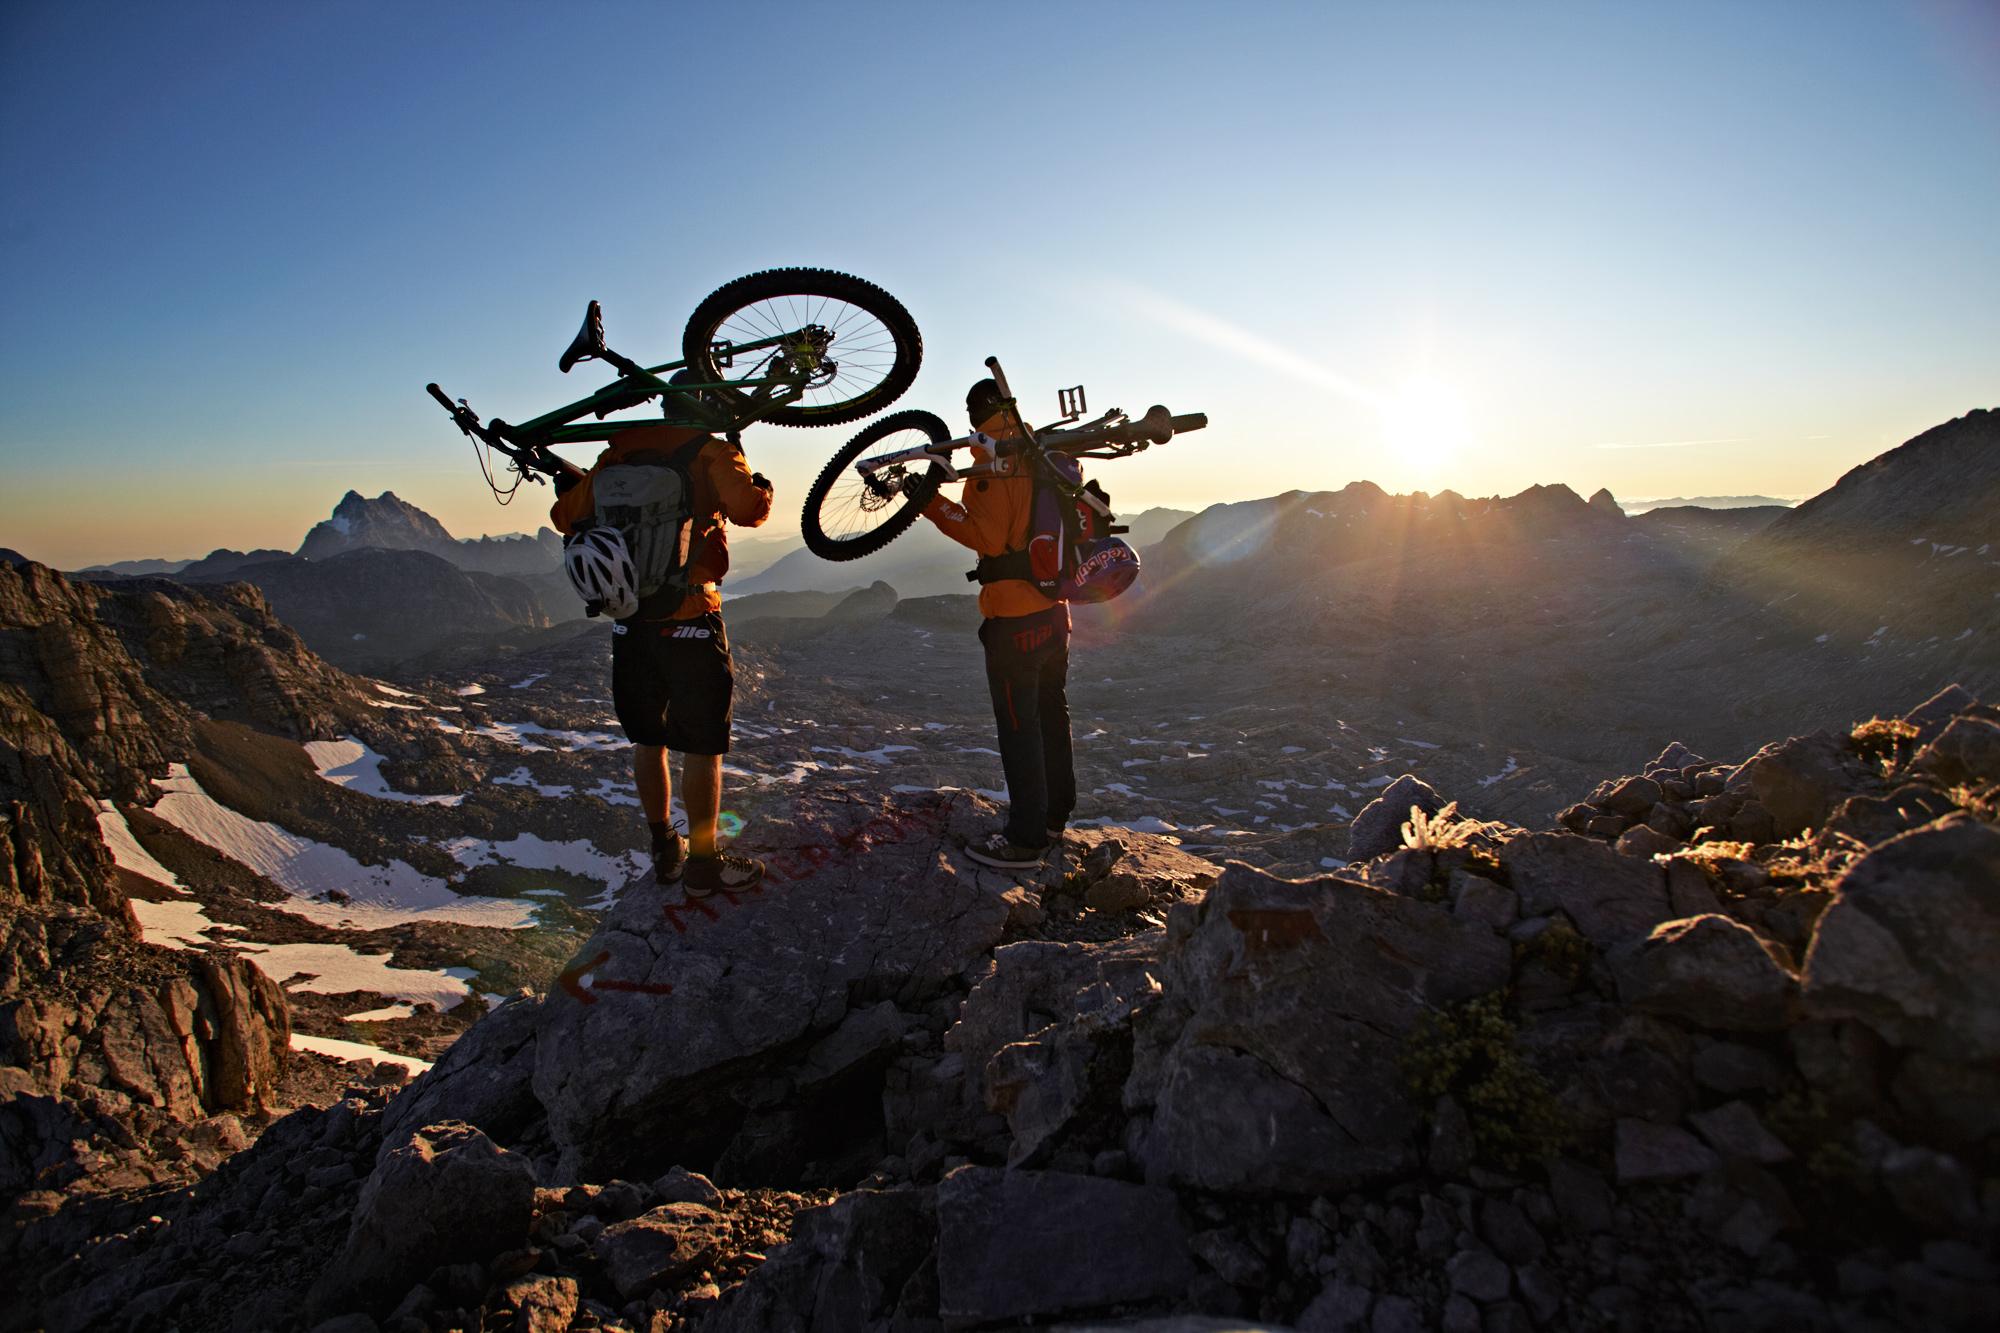 Trials World Champion Tom Öhler and me on Breithorn summit © Sebastian Doerk